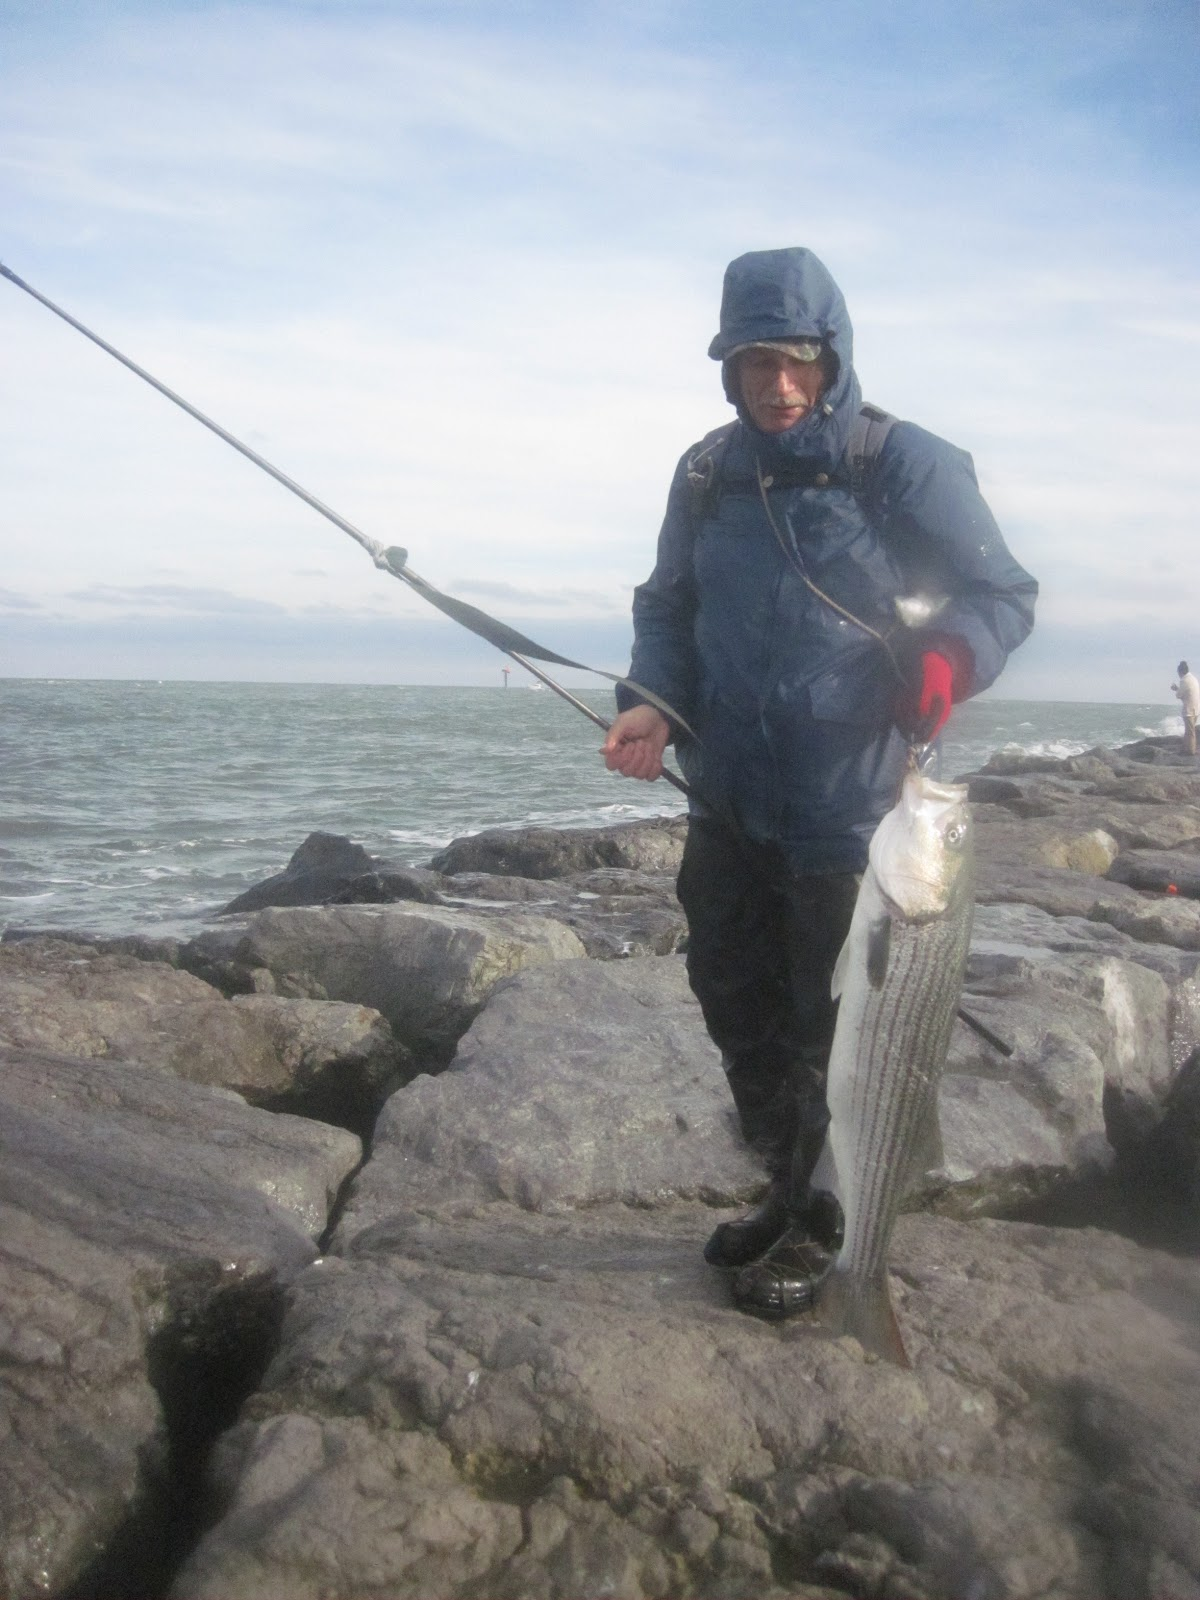 New jersey fishing report fishing new jersey nj for New jersey fishing reports